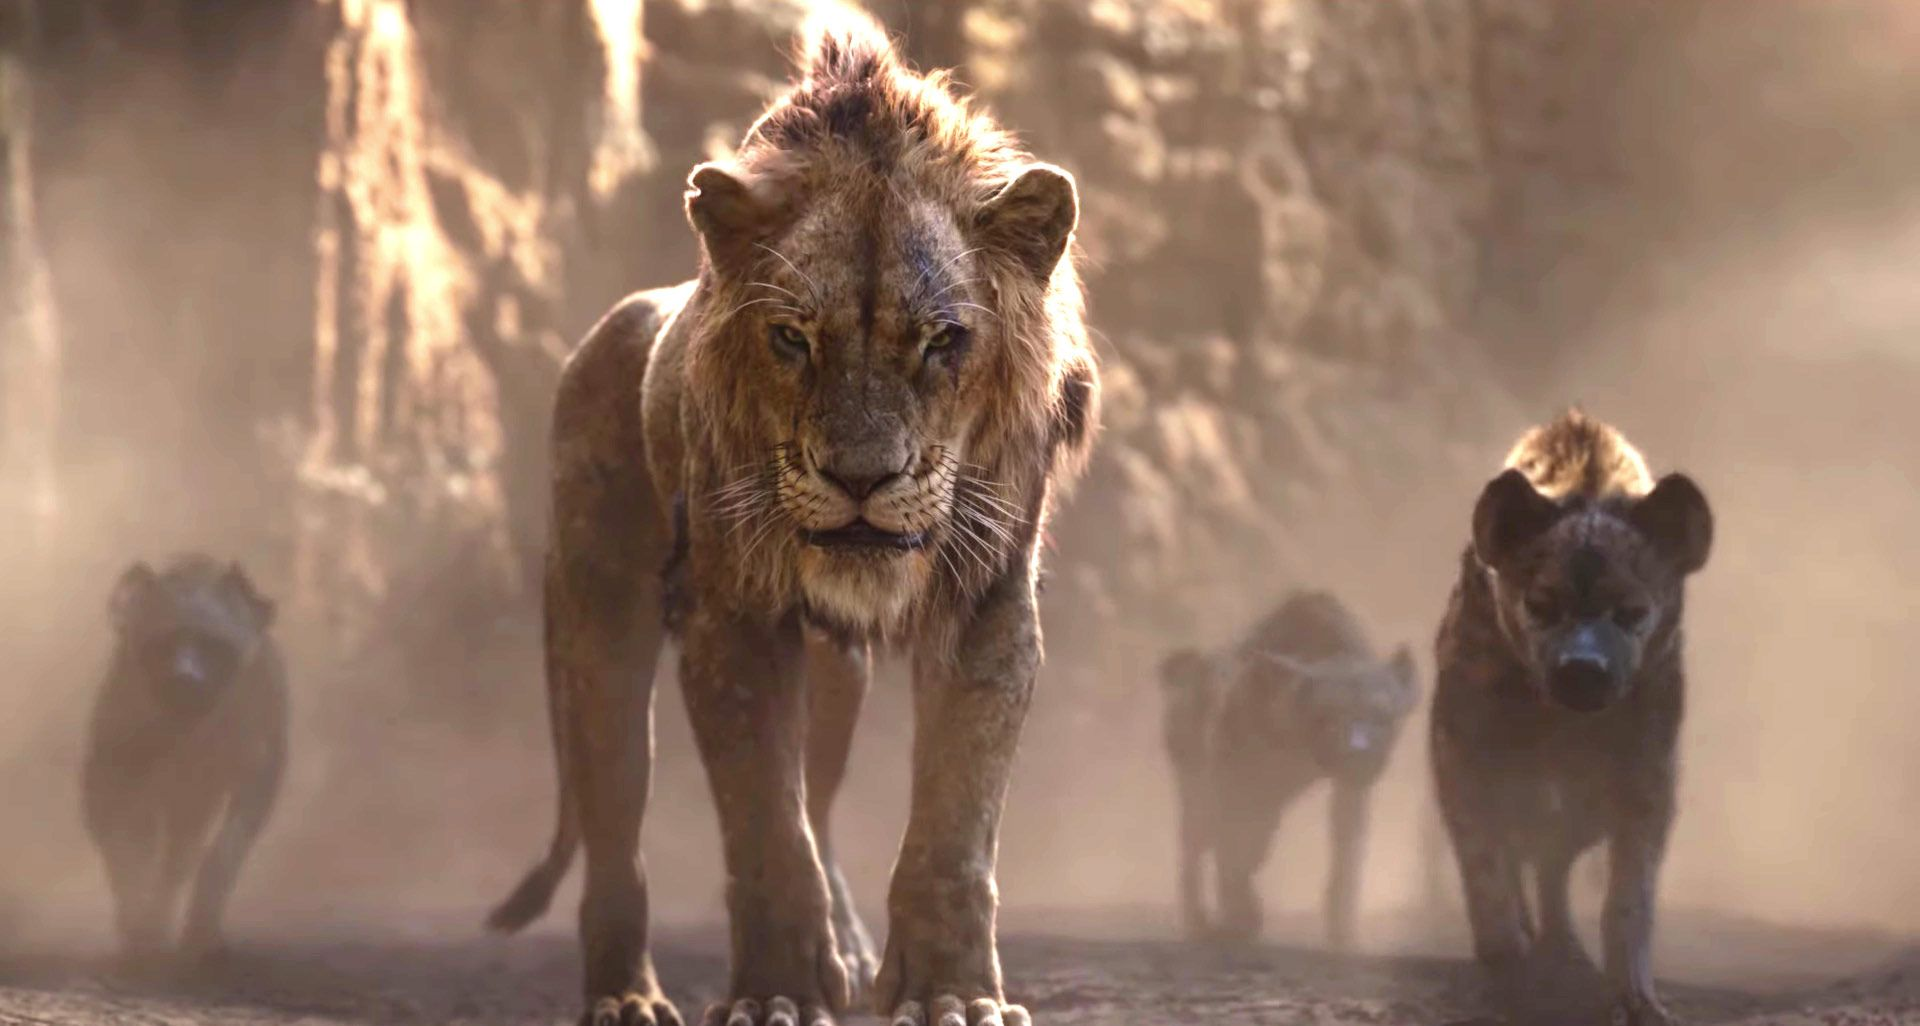 scar-the-lion-king-trailer-1554898651.jpg